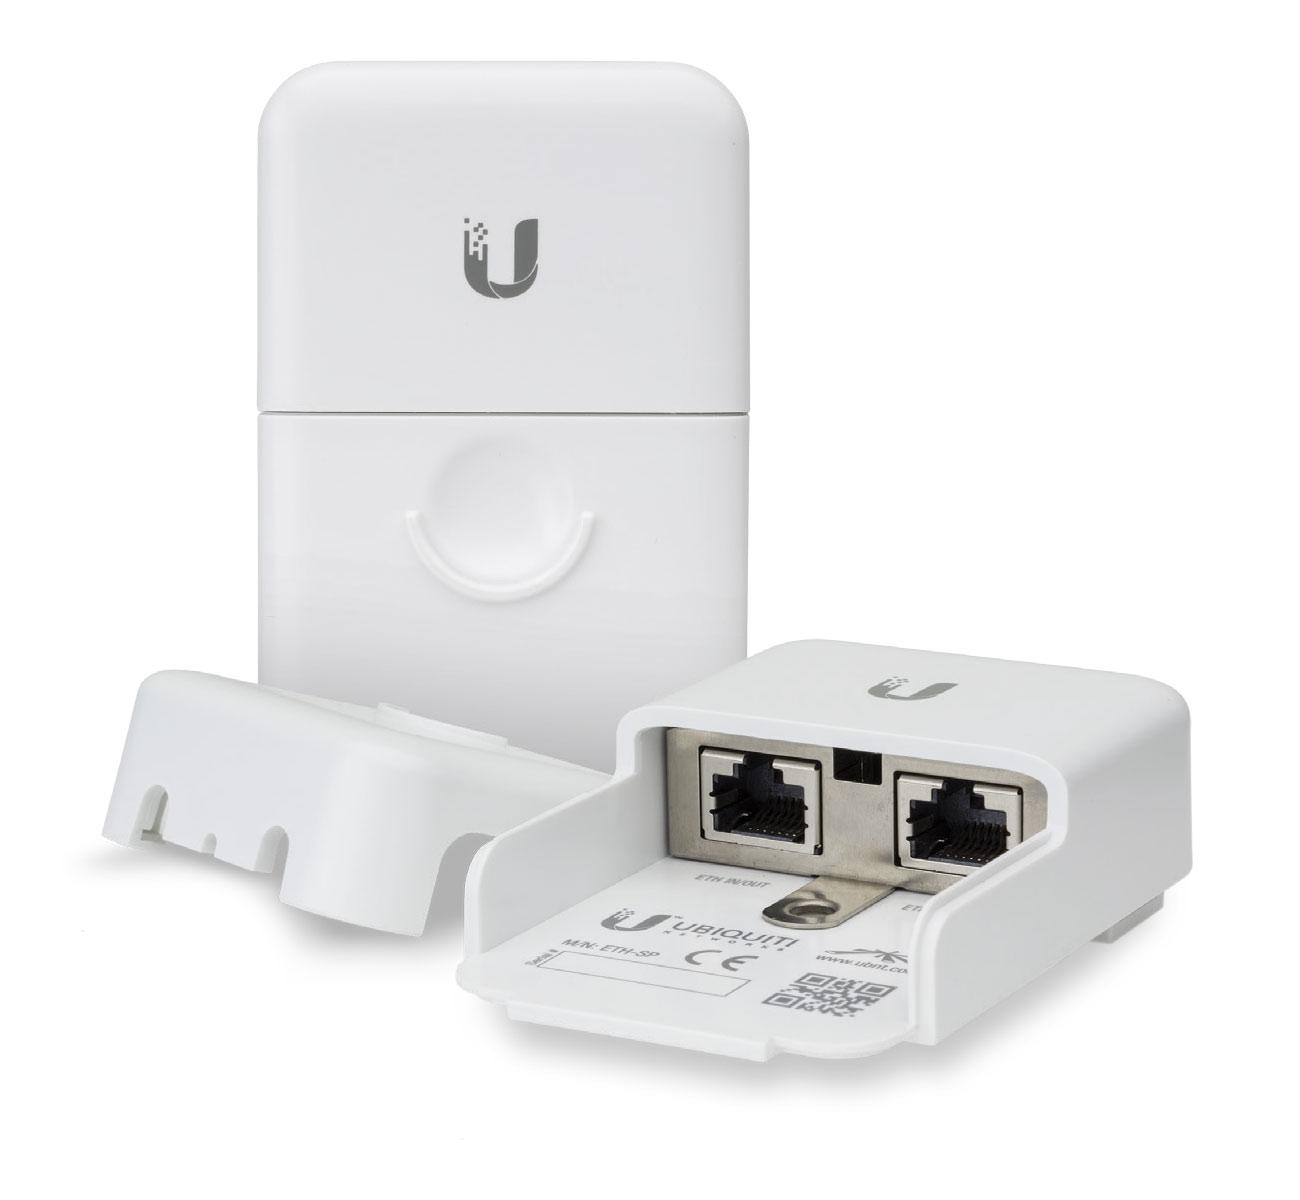 Ethernet surge protectorEthernet Überspannungsschutz ubiquiti - lisconet.com